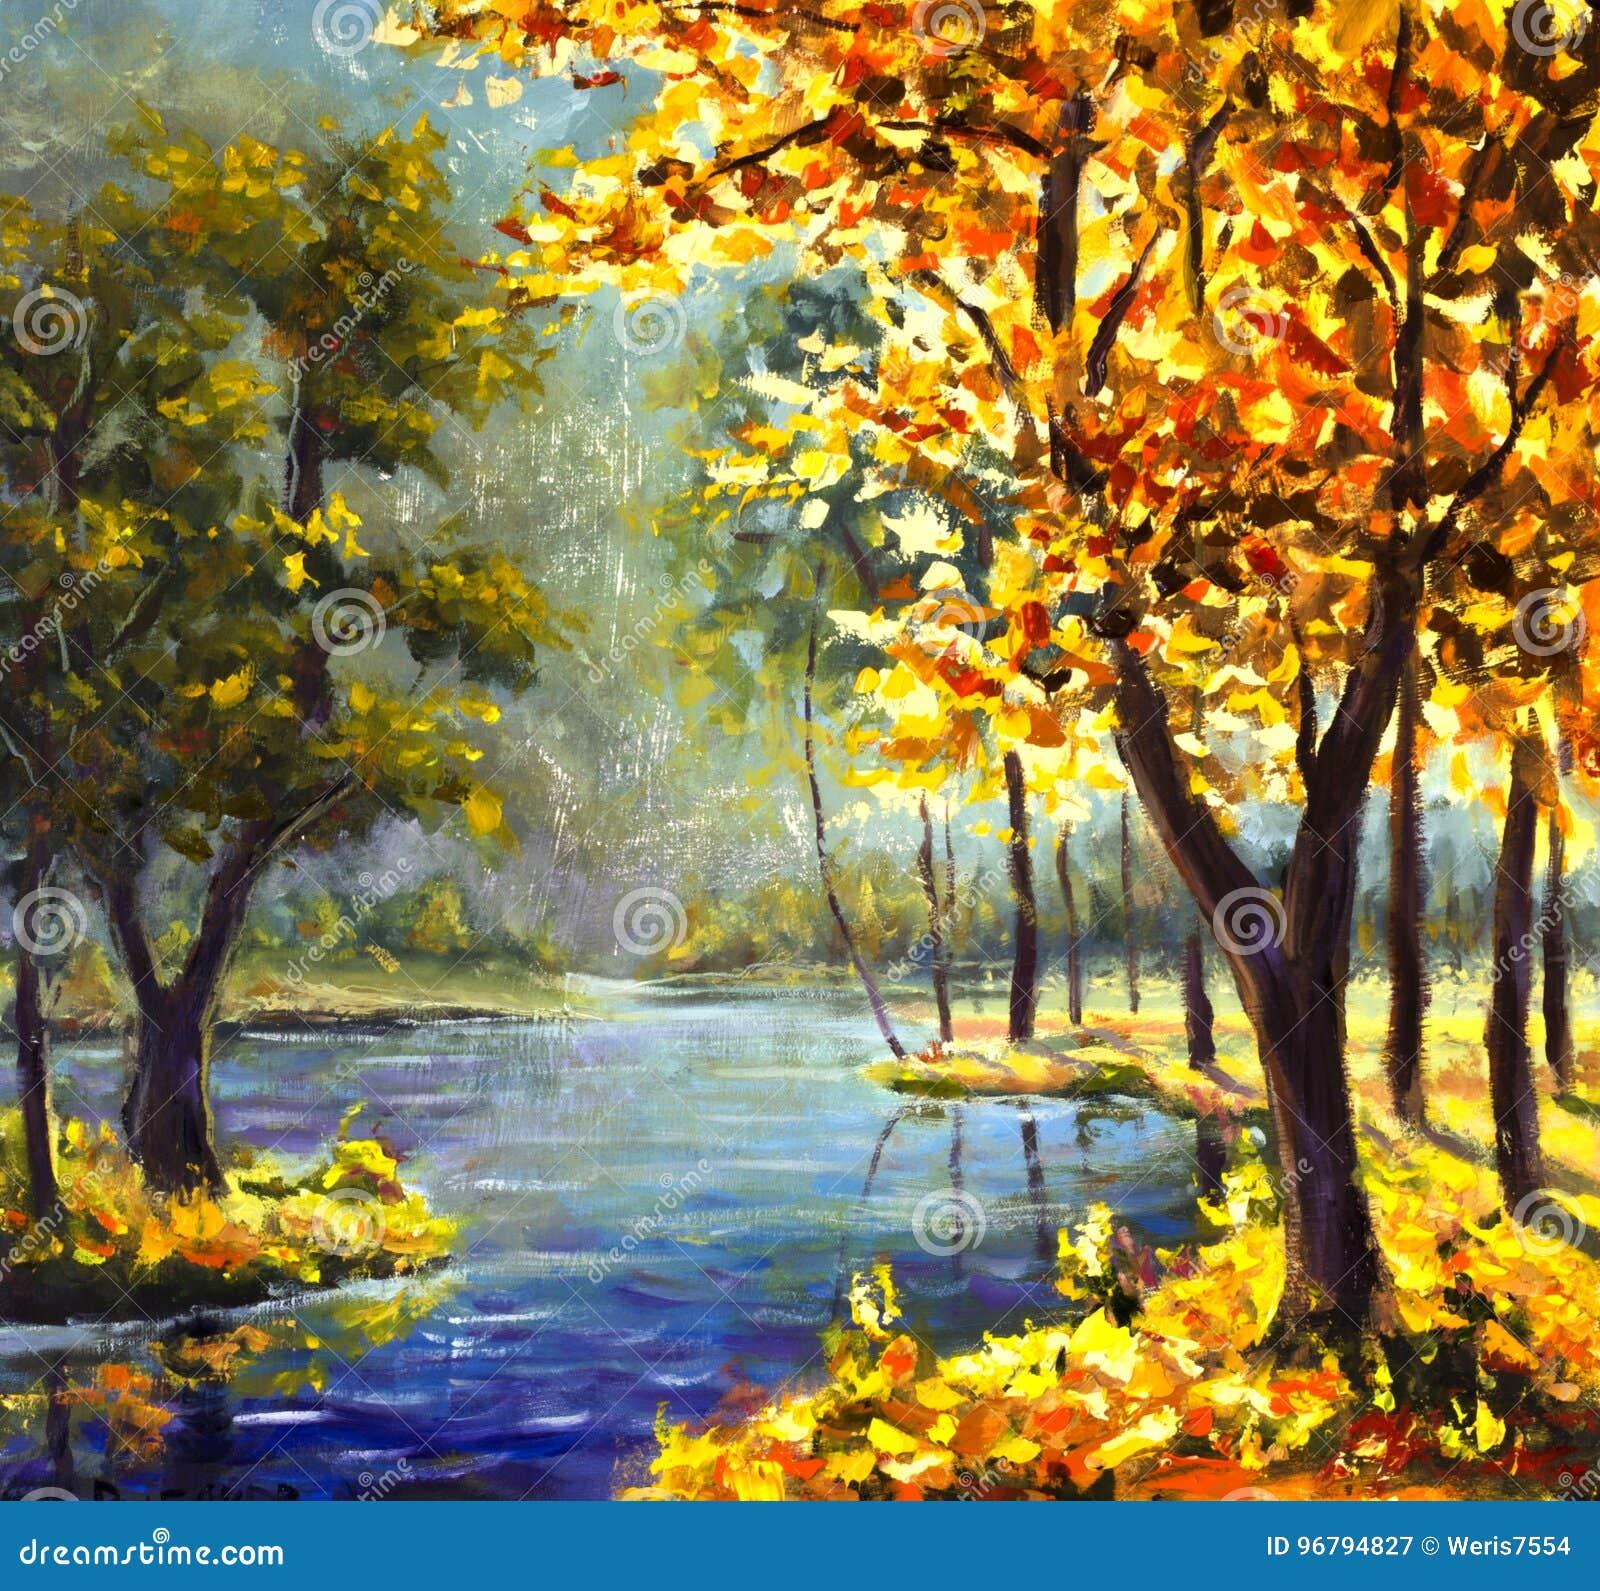 Original Handpainted Oil Painting Sunny Big Autumn Orange Tree ...